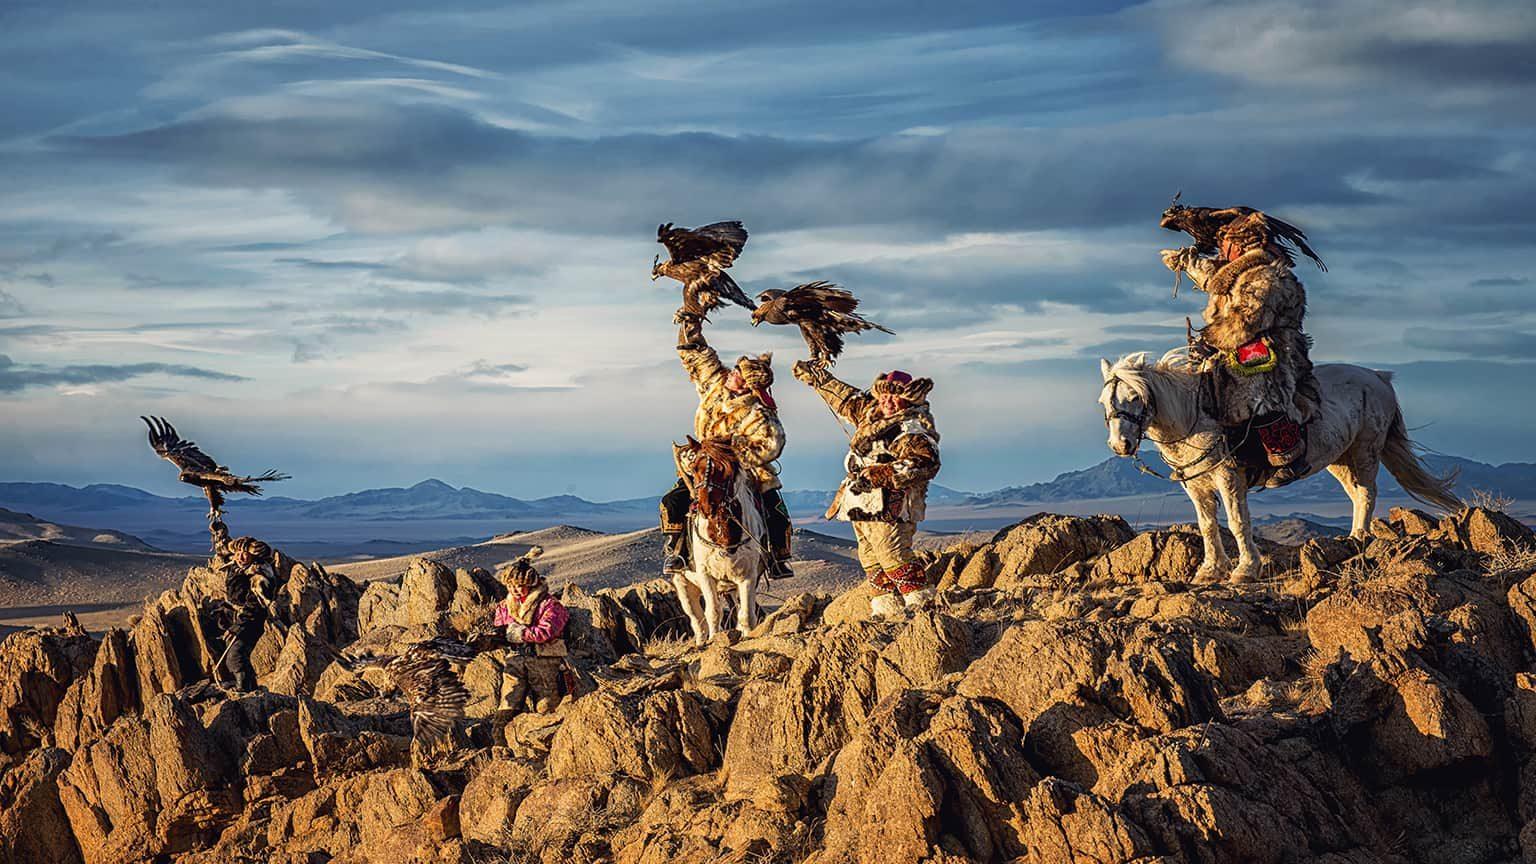 Mongolian eagle hunters on Altai Mountain, Mongolia